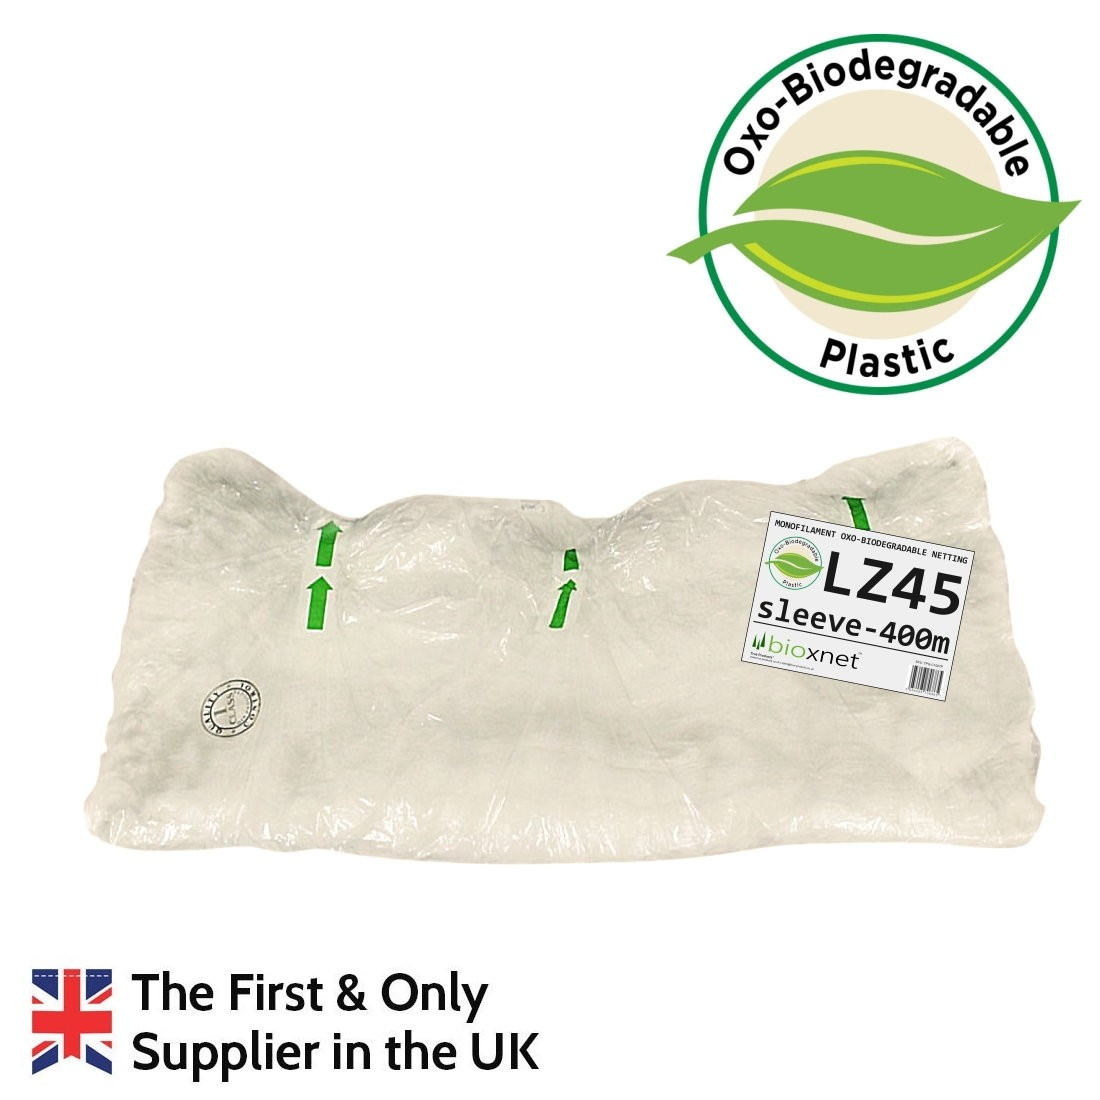 BioXnet Biodegradable Christmas Tree Netting LZ